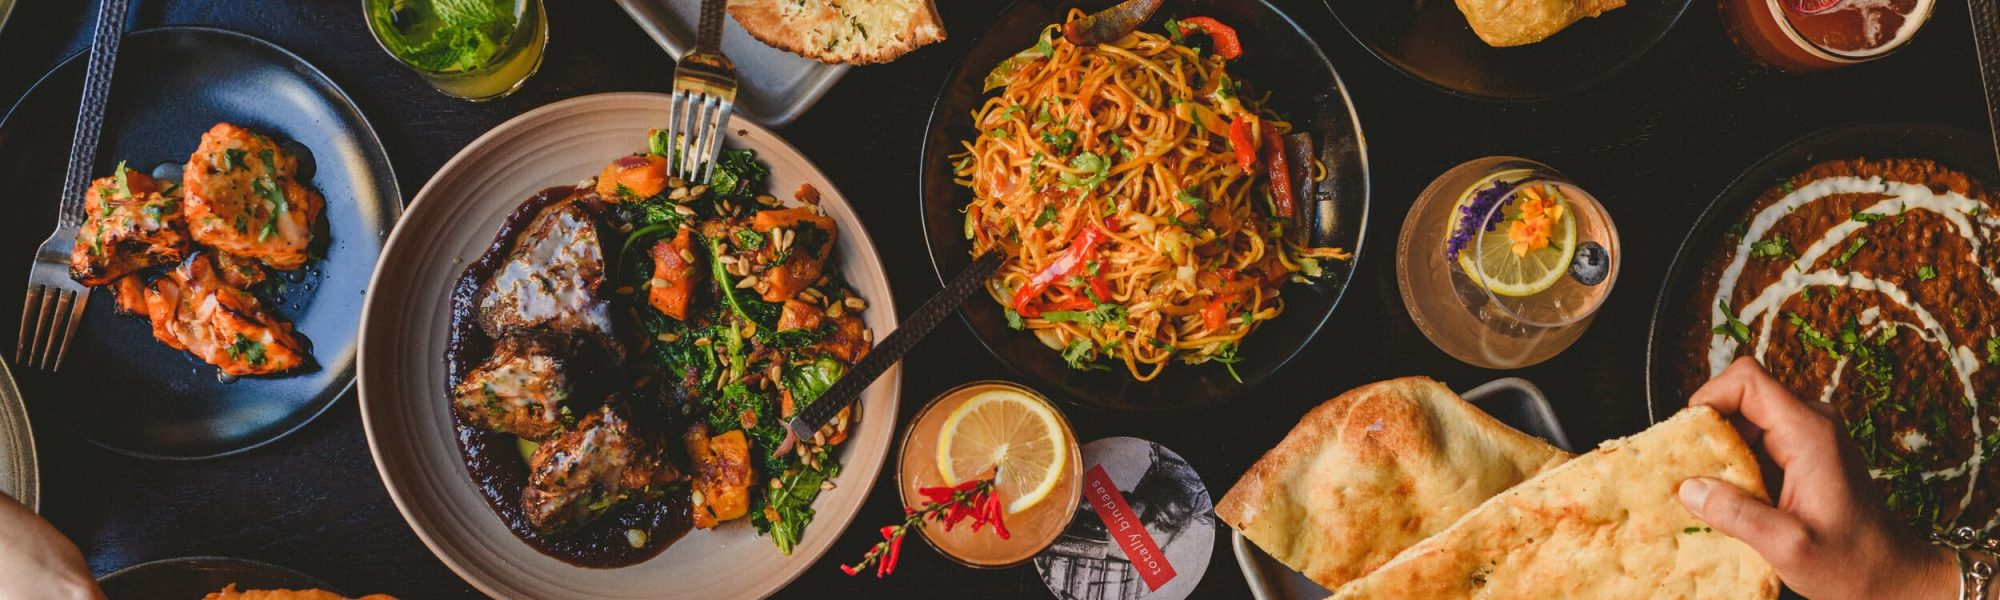 10 Tasty Street foods in India